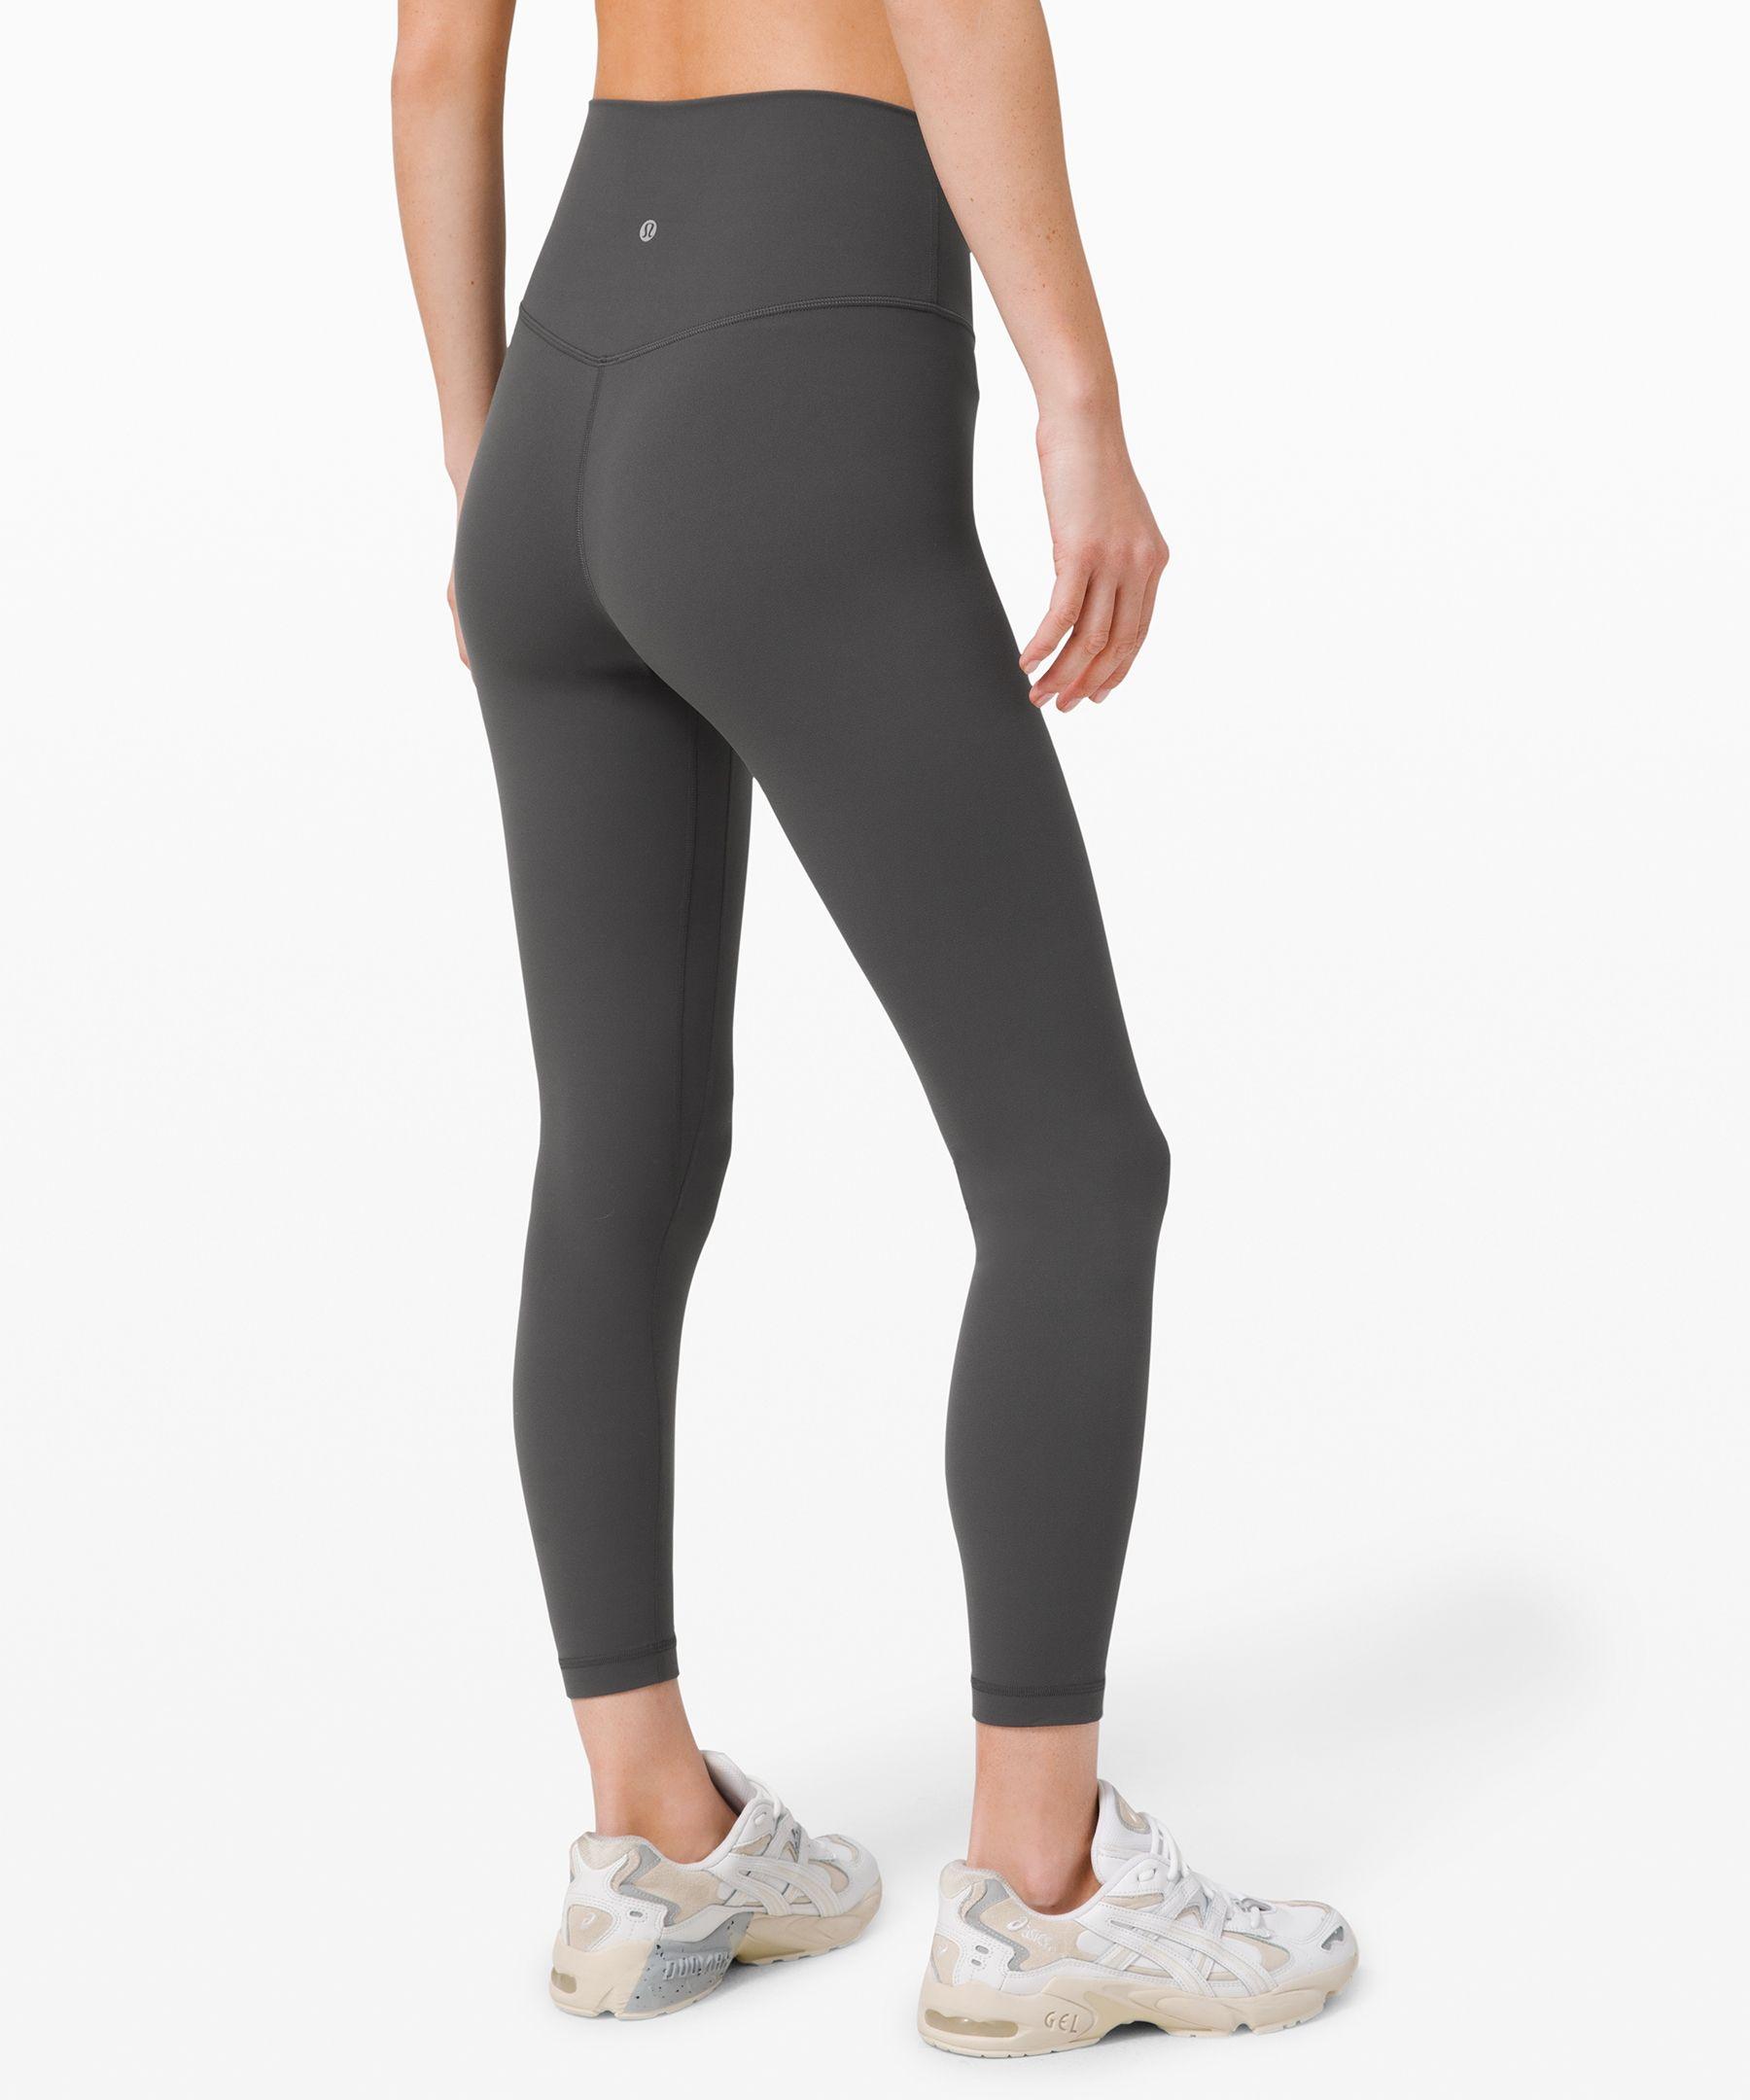 "lululemon Women's Align Pant II 25"", Graphite Grey, Size 6"